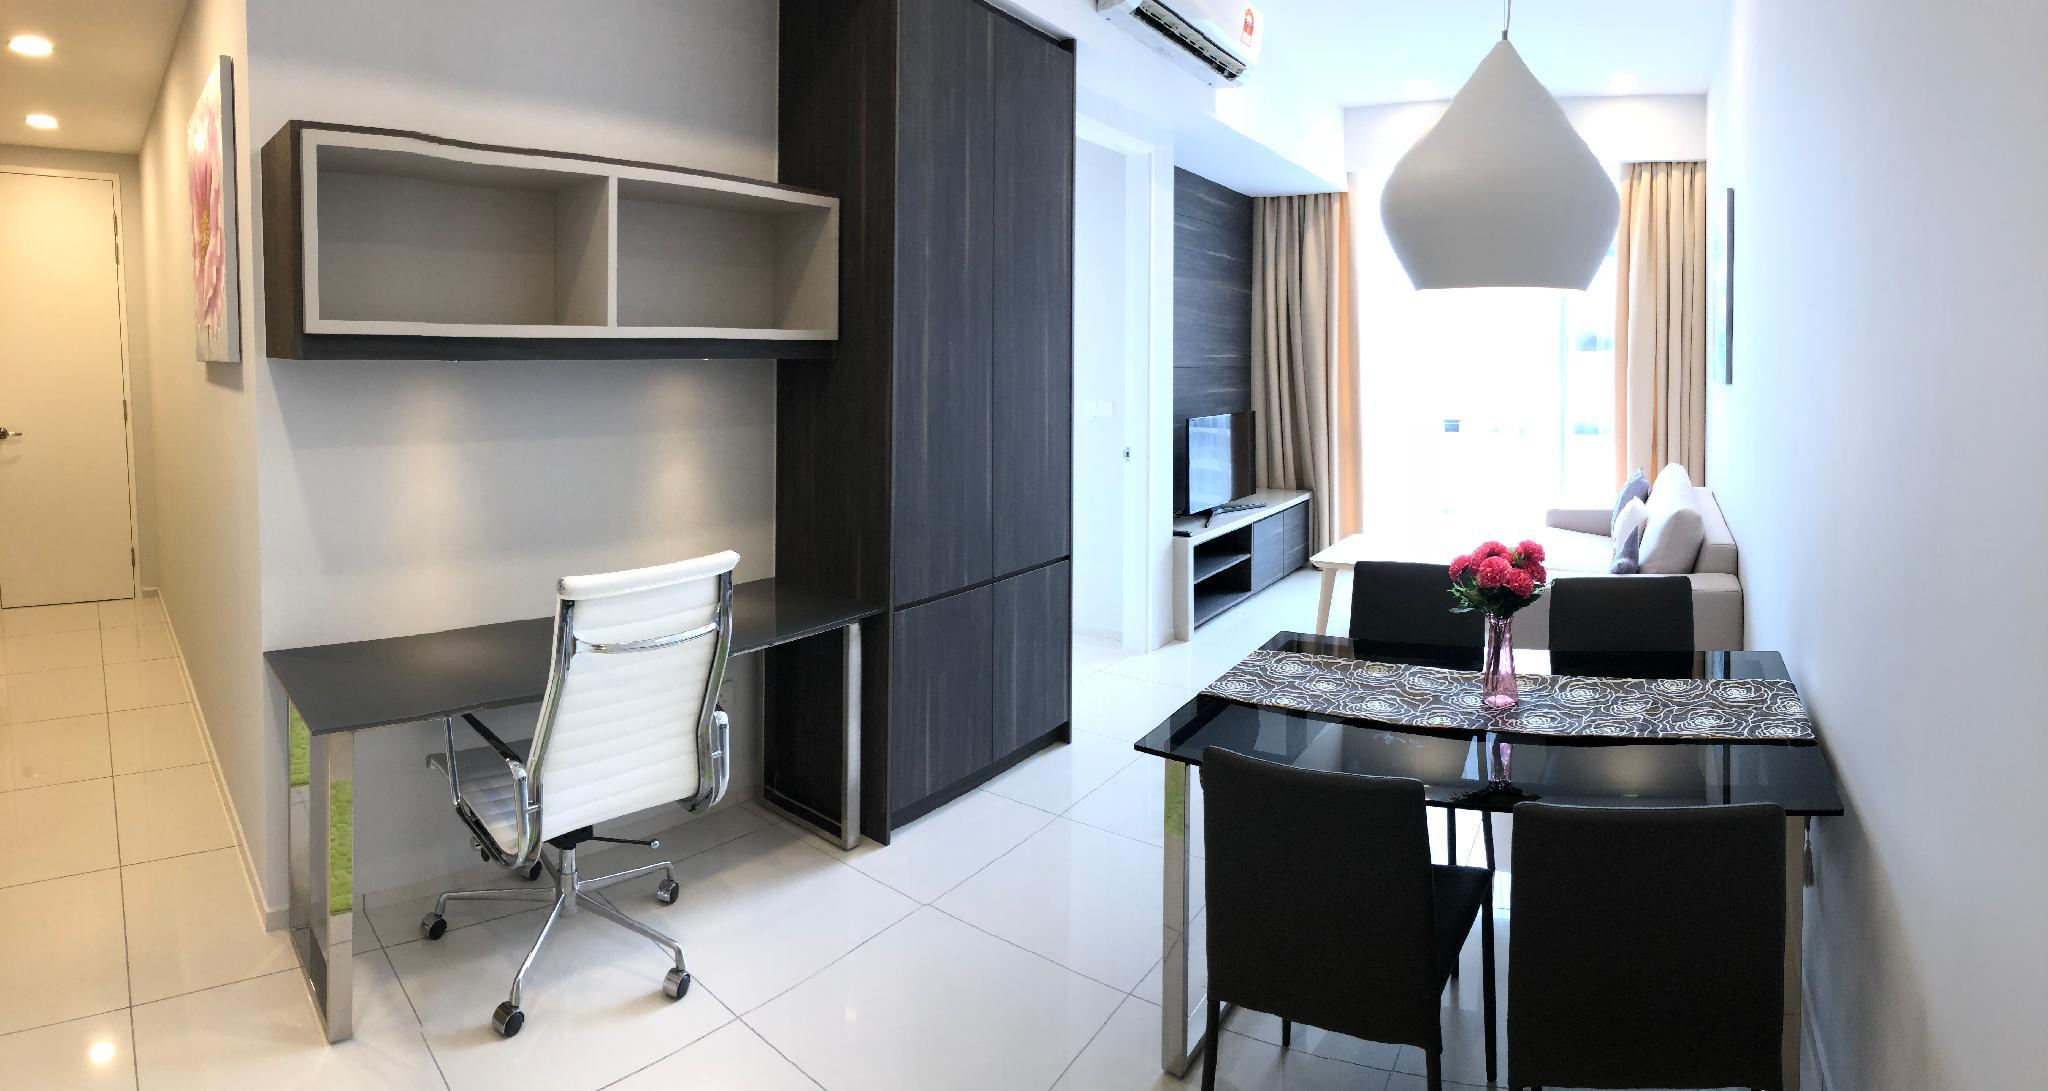 301 Superb View One Bedroom Studio Bukit Bintang